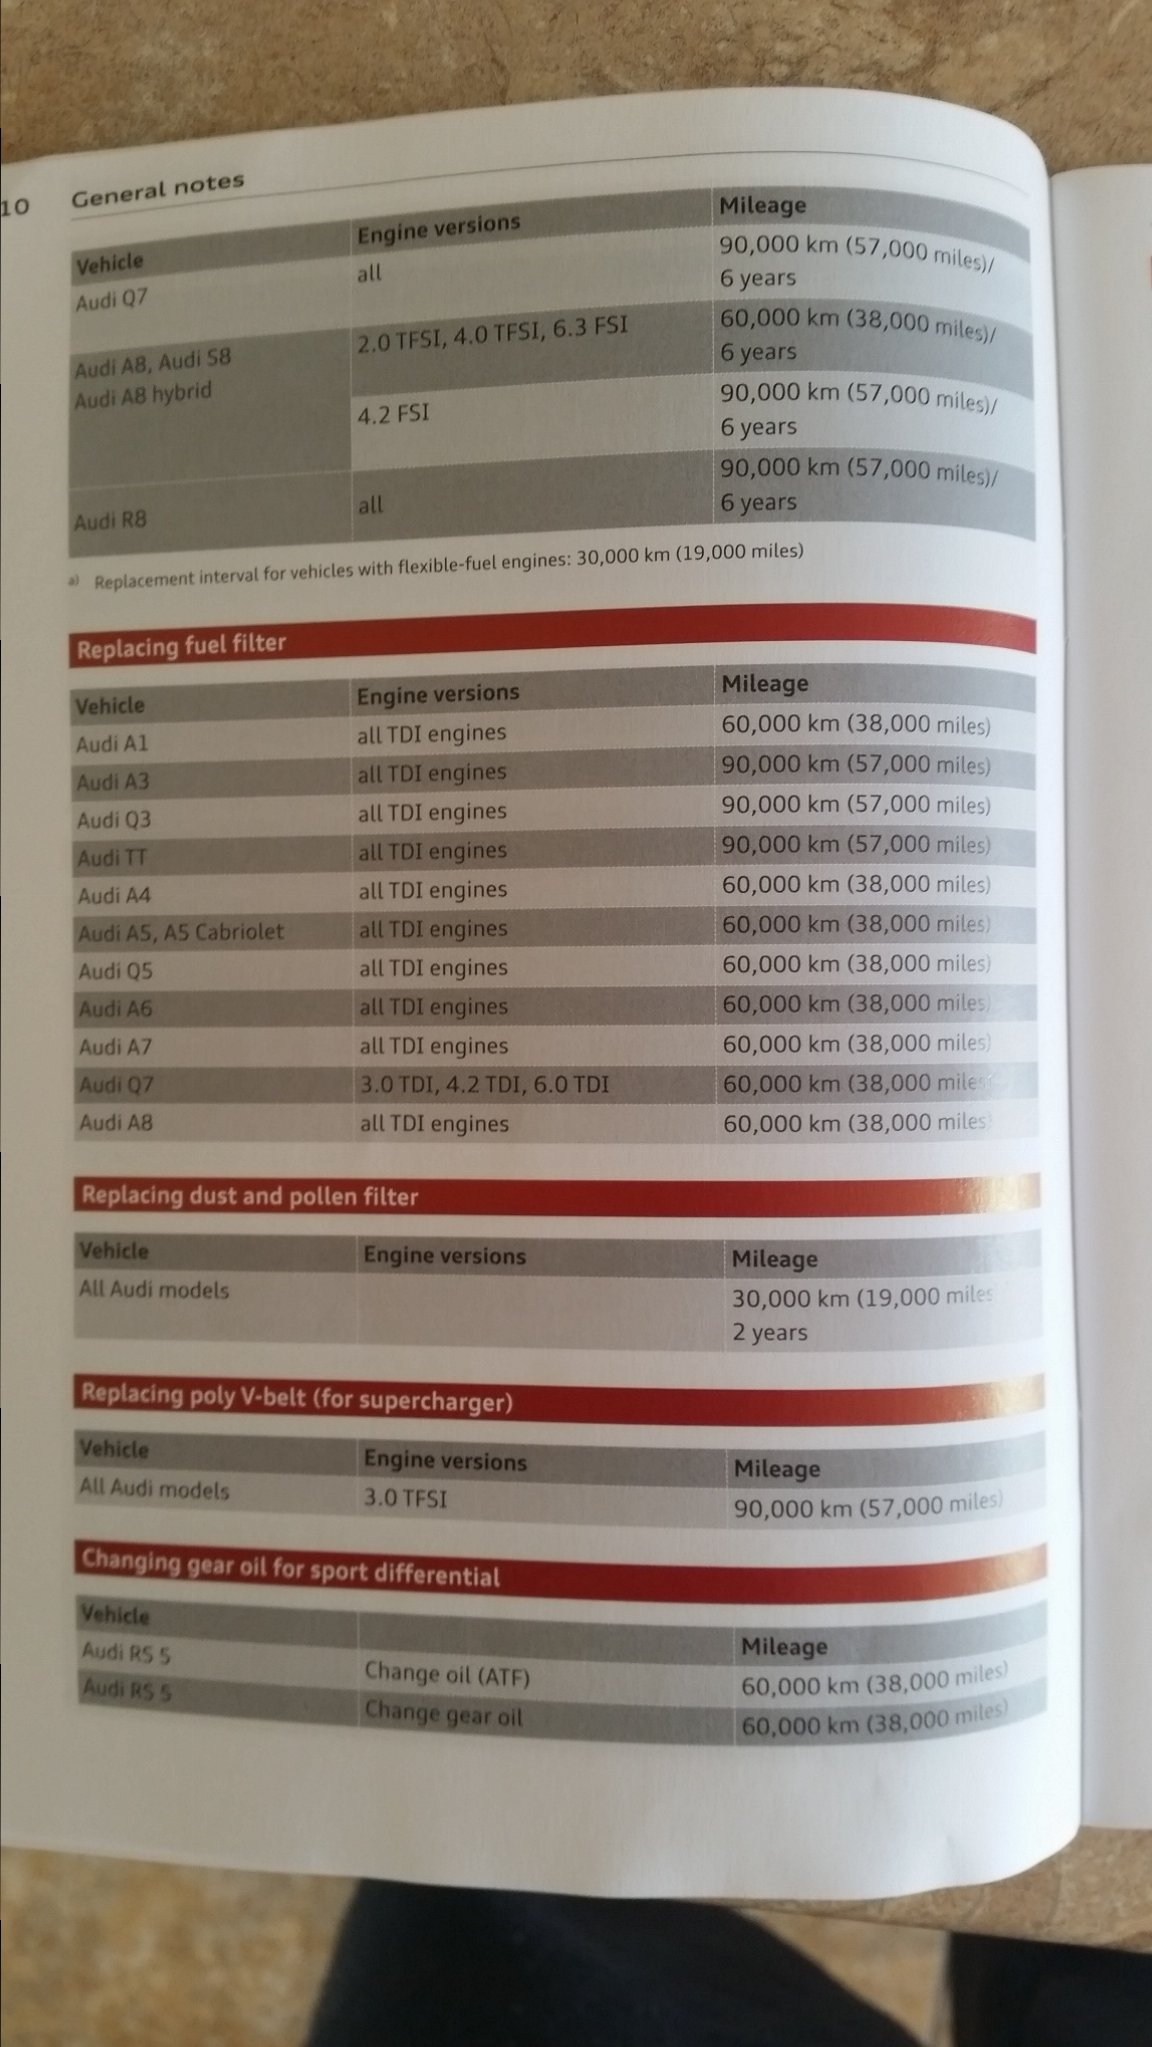 S B Maintenance Schedule AudiSportnet - Audi a4 maintenance schedule